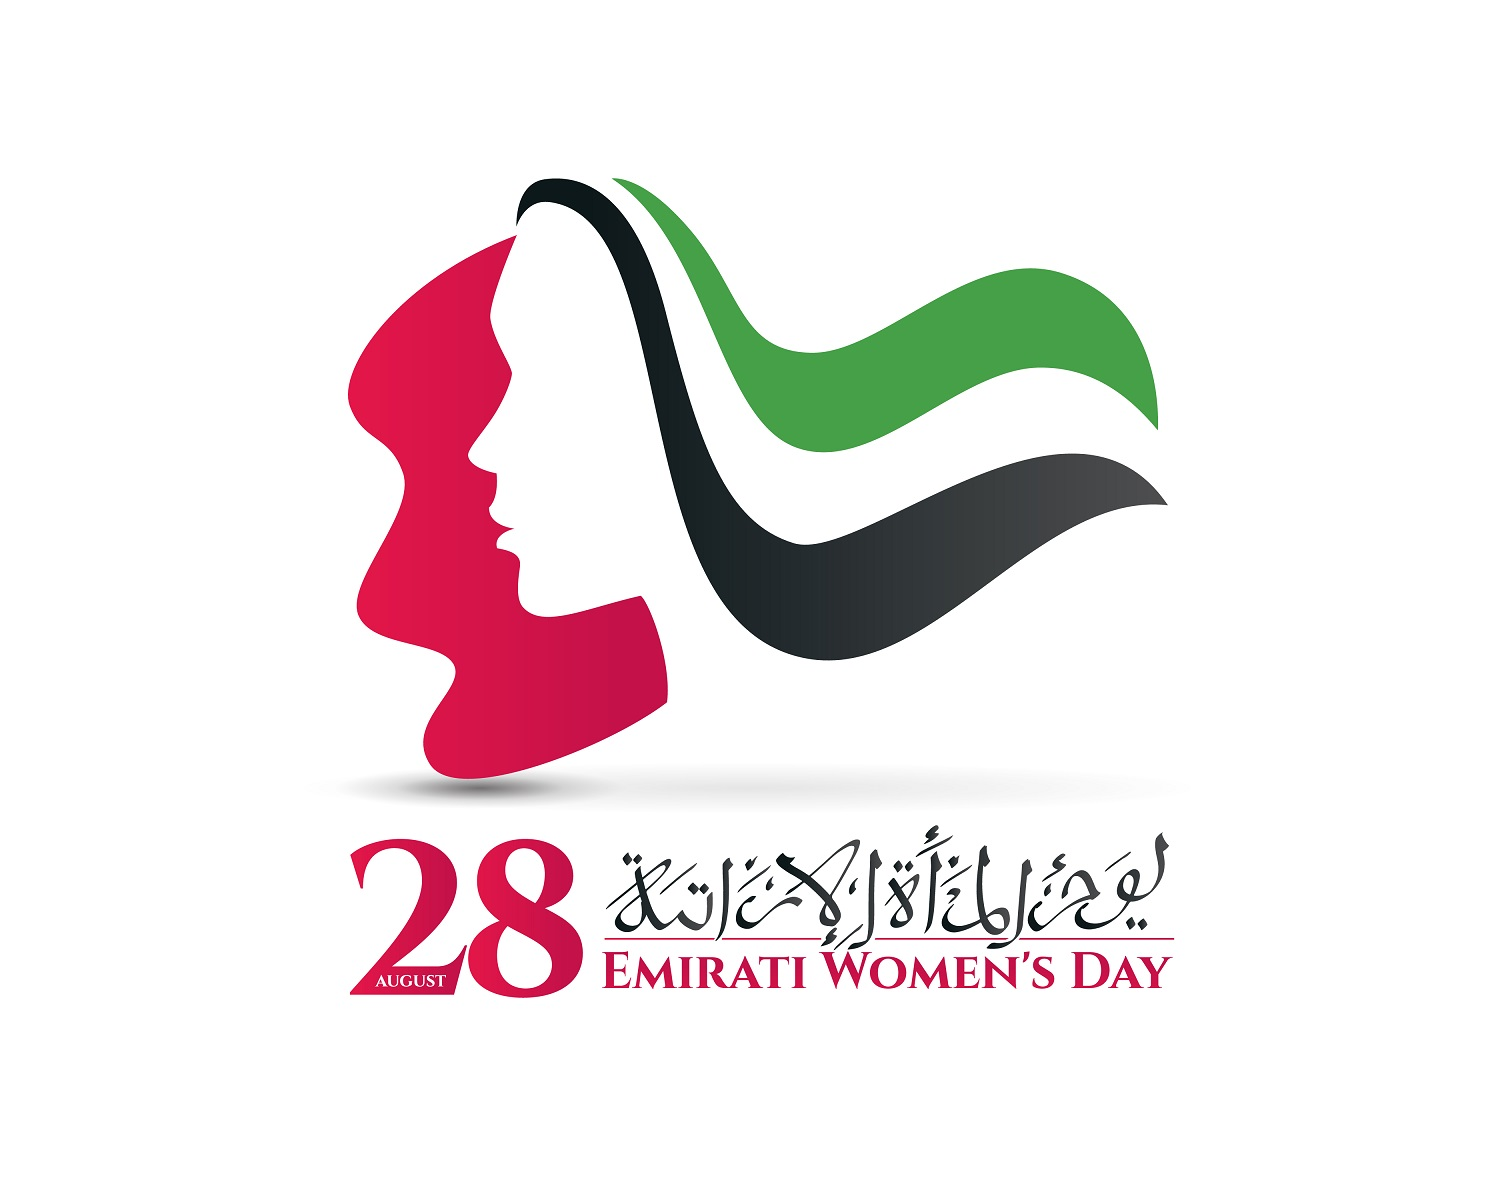 Emirati Women's Day: Female leaders continue to shape the future of the UAE